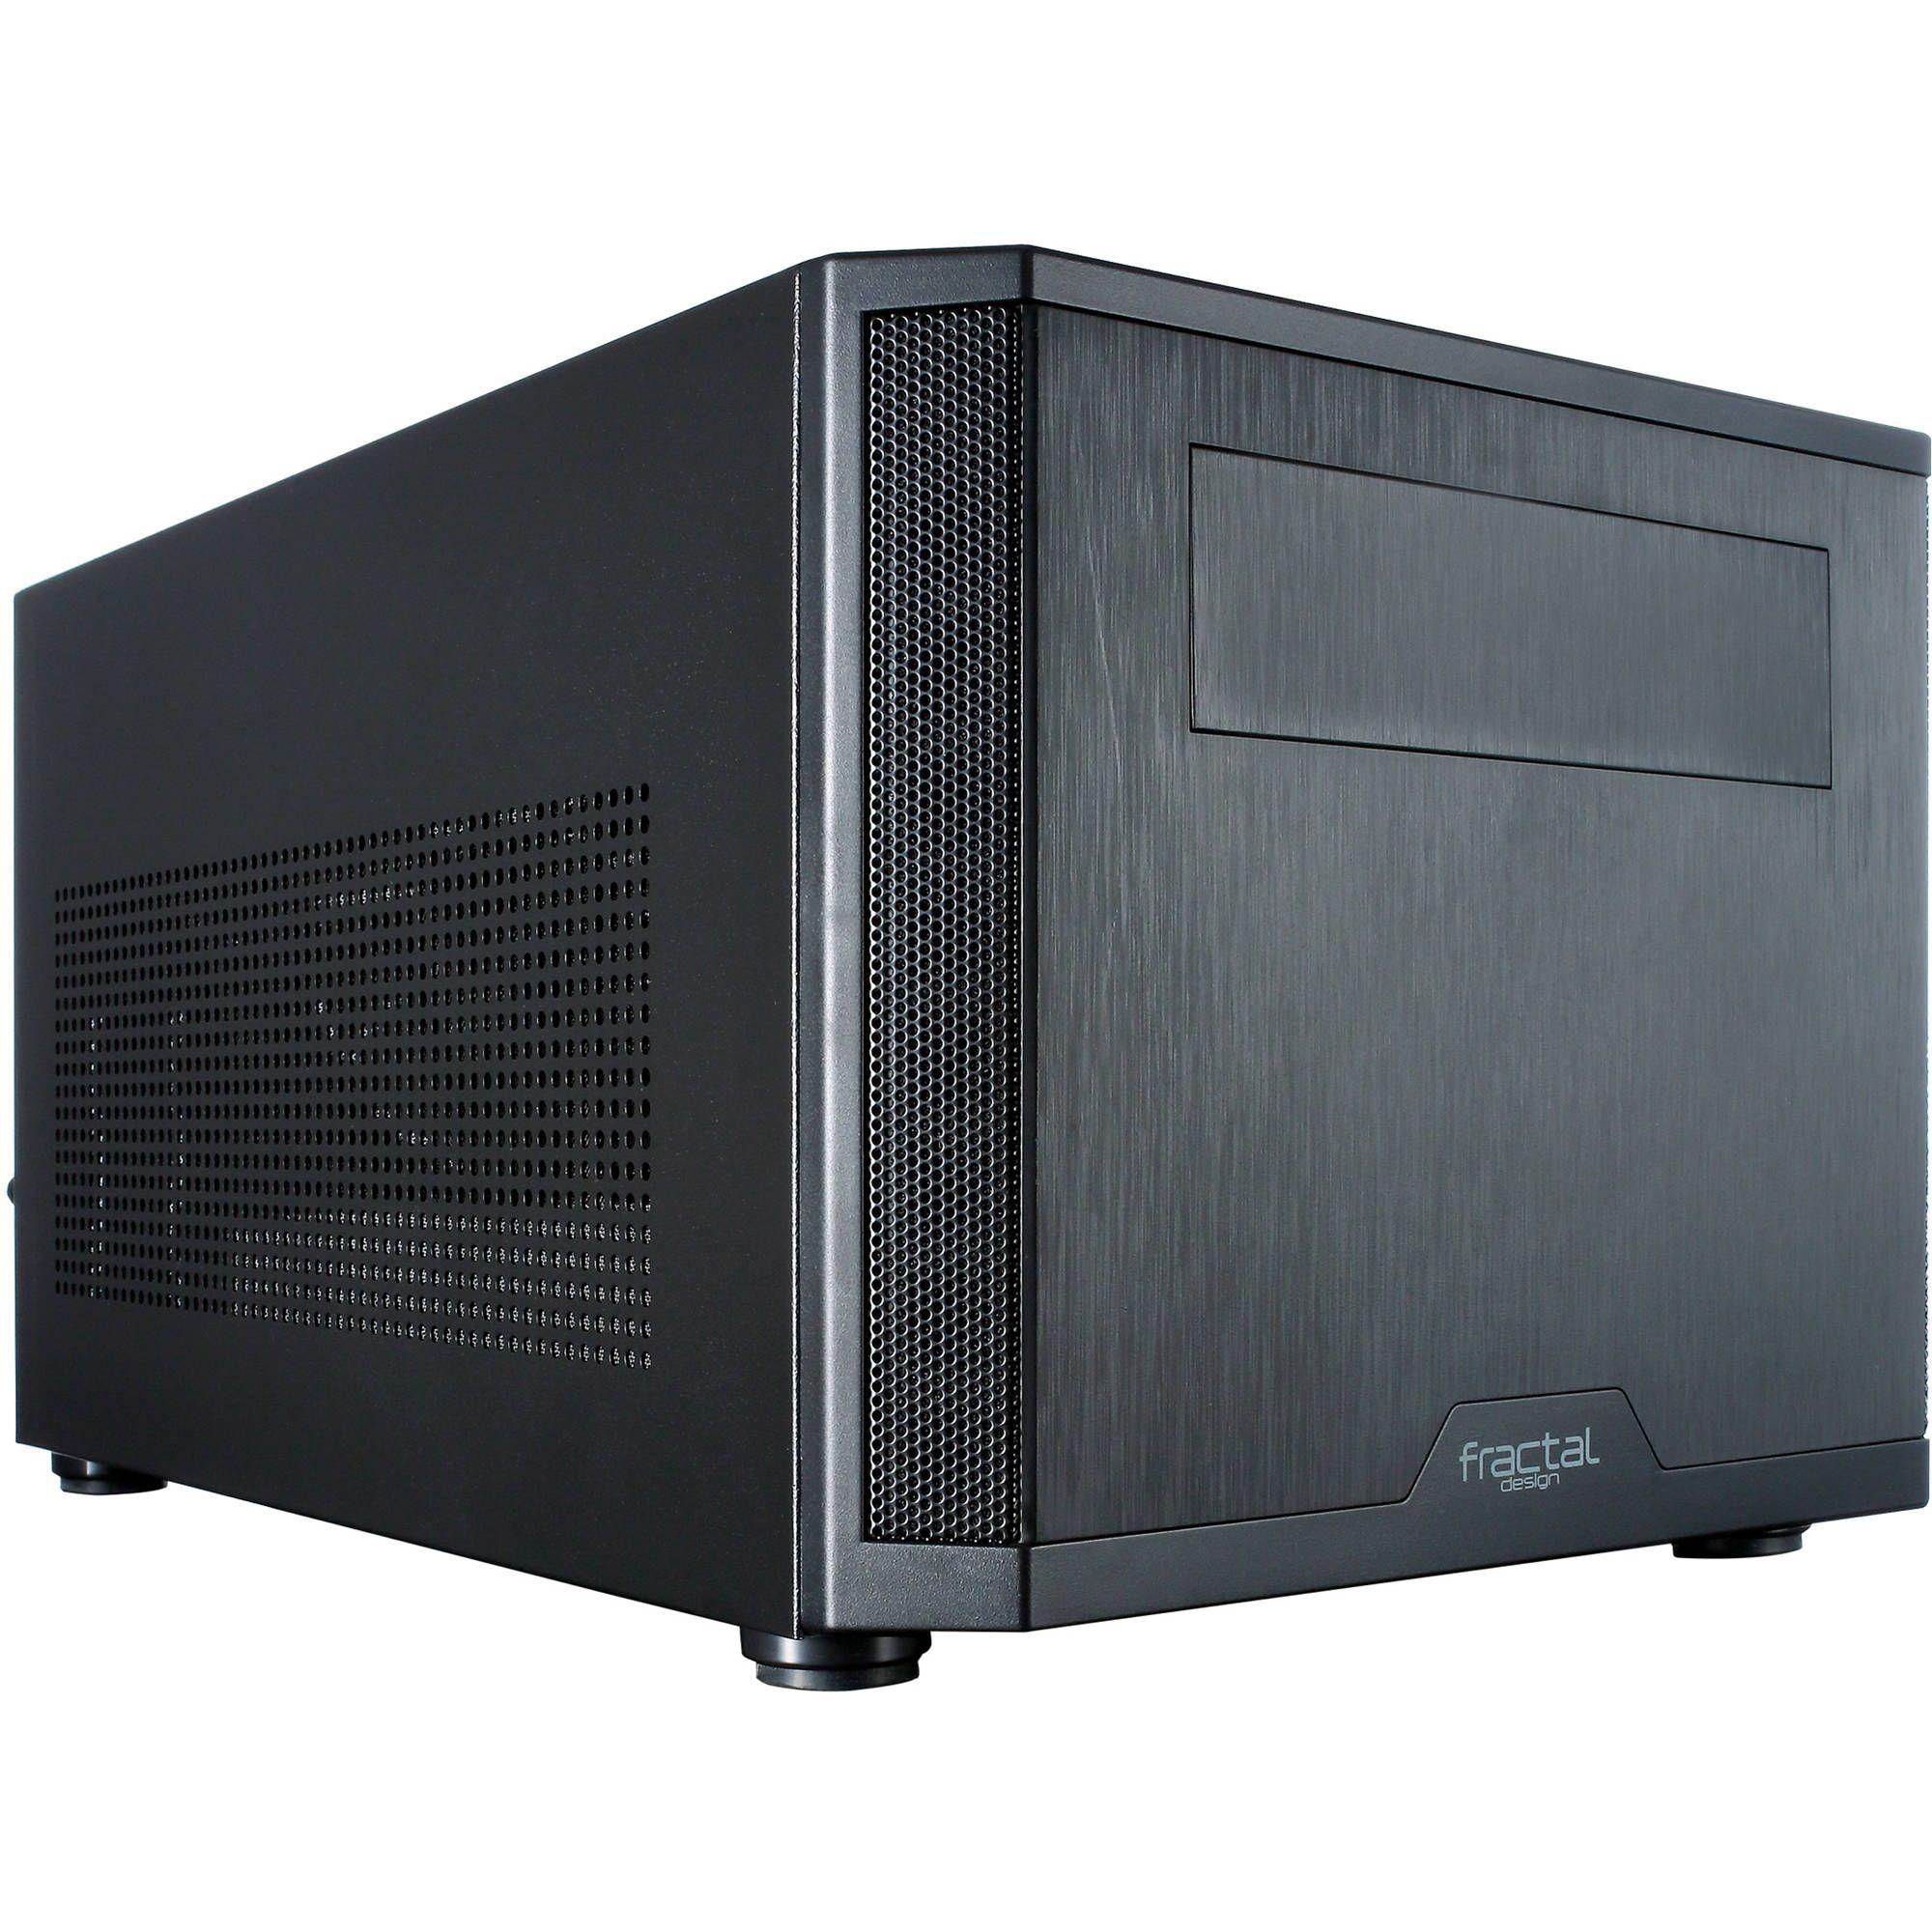 Boitier PC Fractal Design Core 500 - Mini ITX